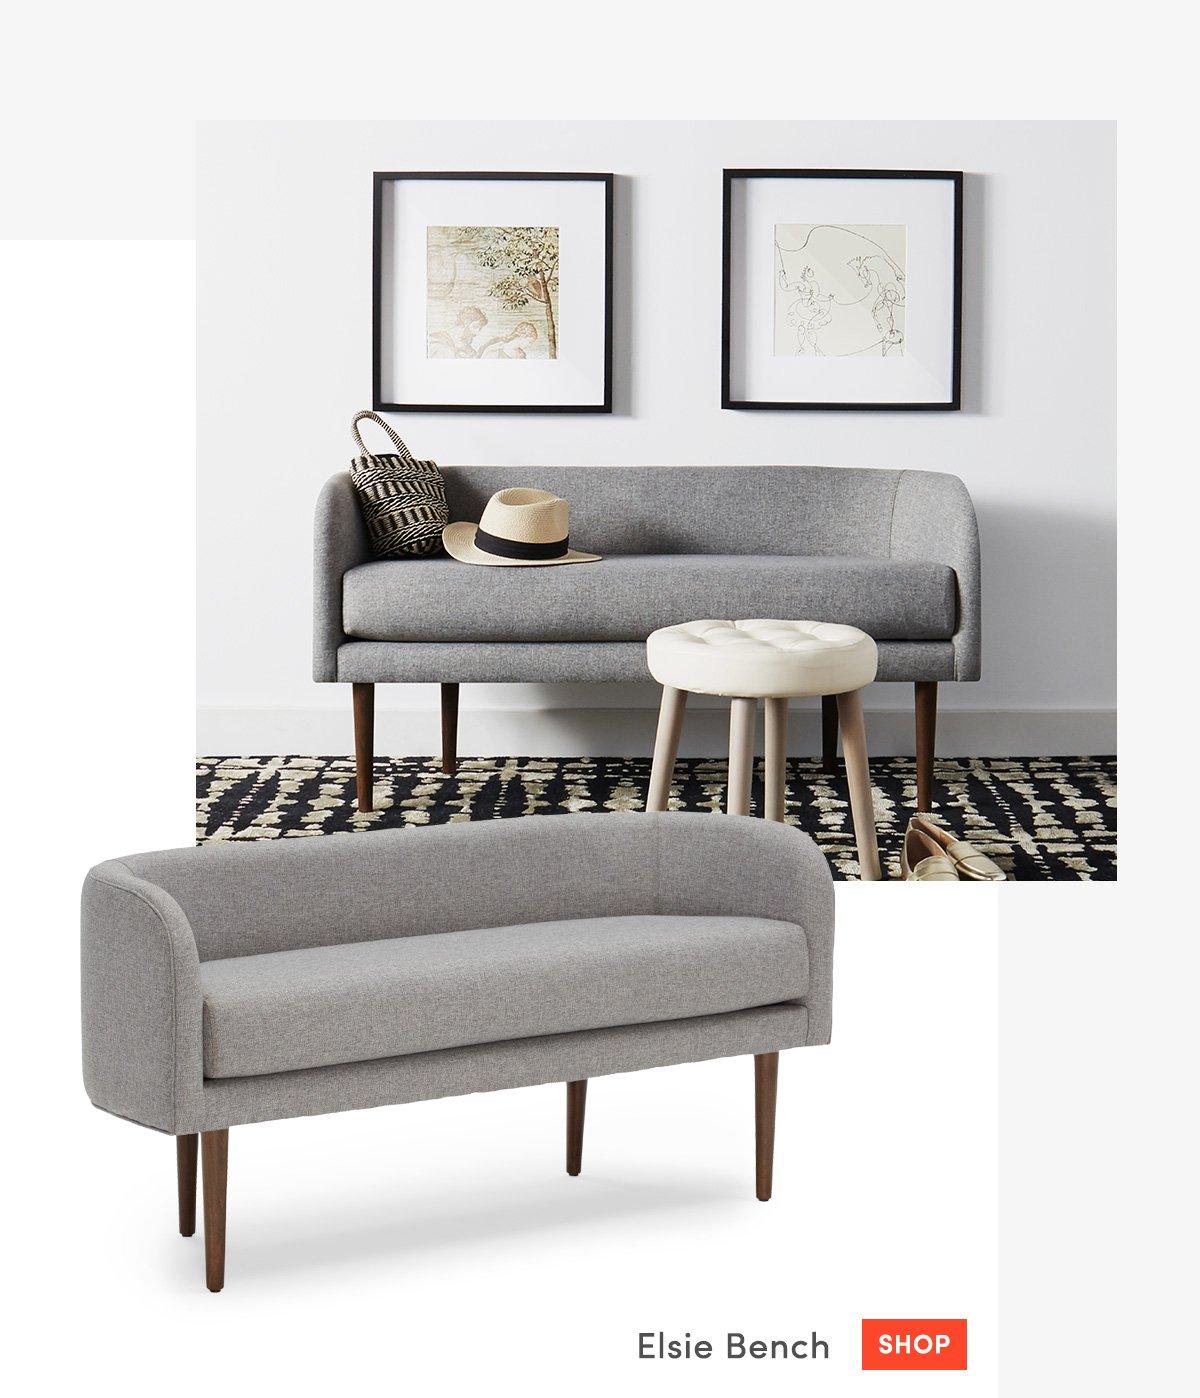 Prime Joybird 3 Seats You Must Meet Milled Uwap Interior Chair Design Uwaporg